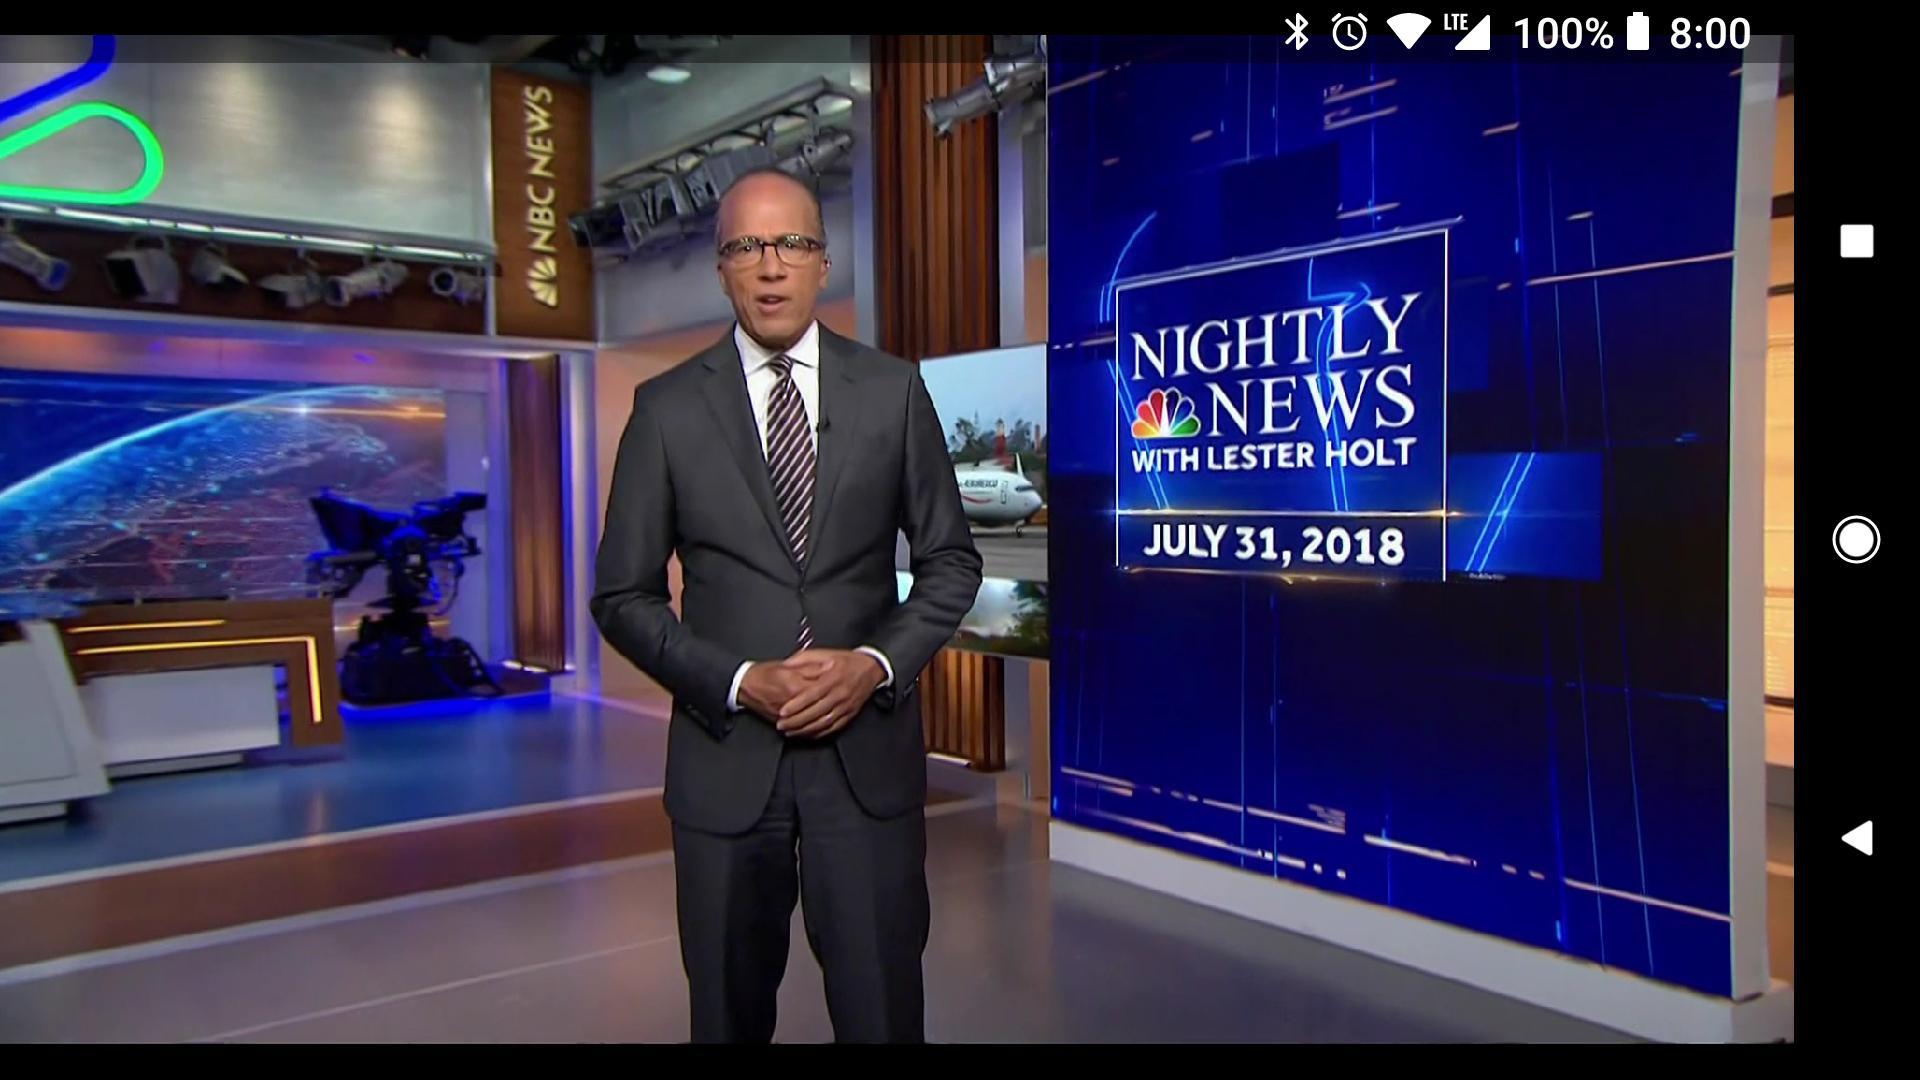 NBC News: Breaking News, US News & Live Video 6.0.11 Screenshot 6